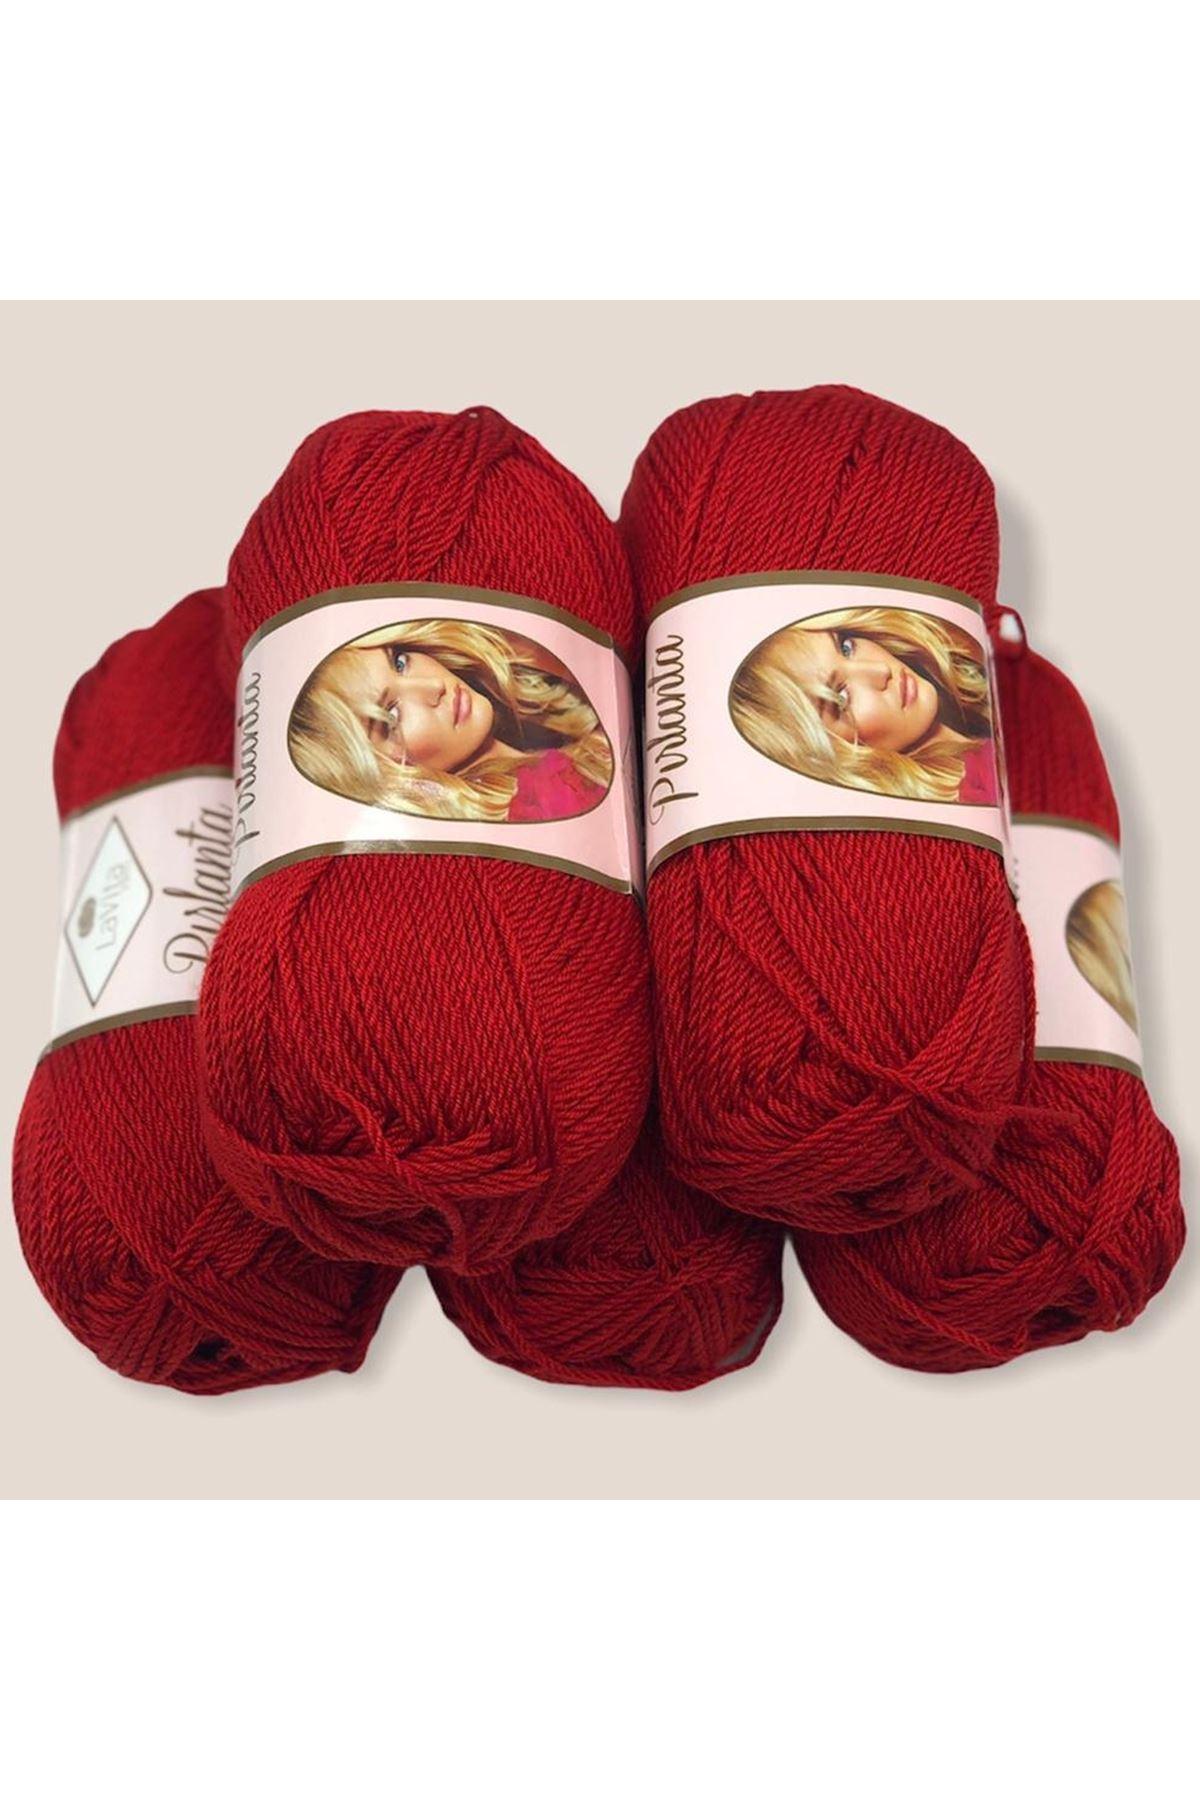 Lavita Pırlanta - 5'li Paket 0136 Koyu Kırmızı